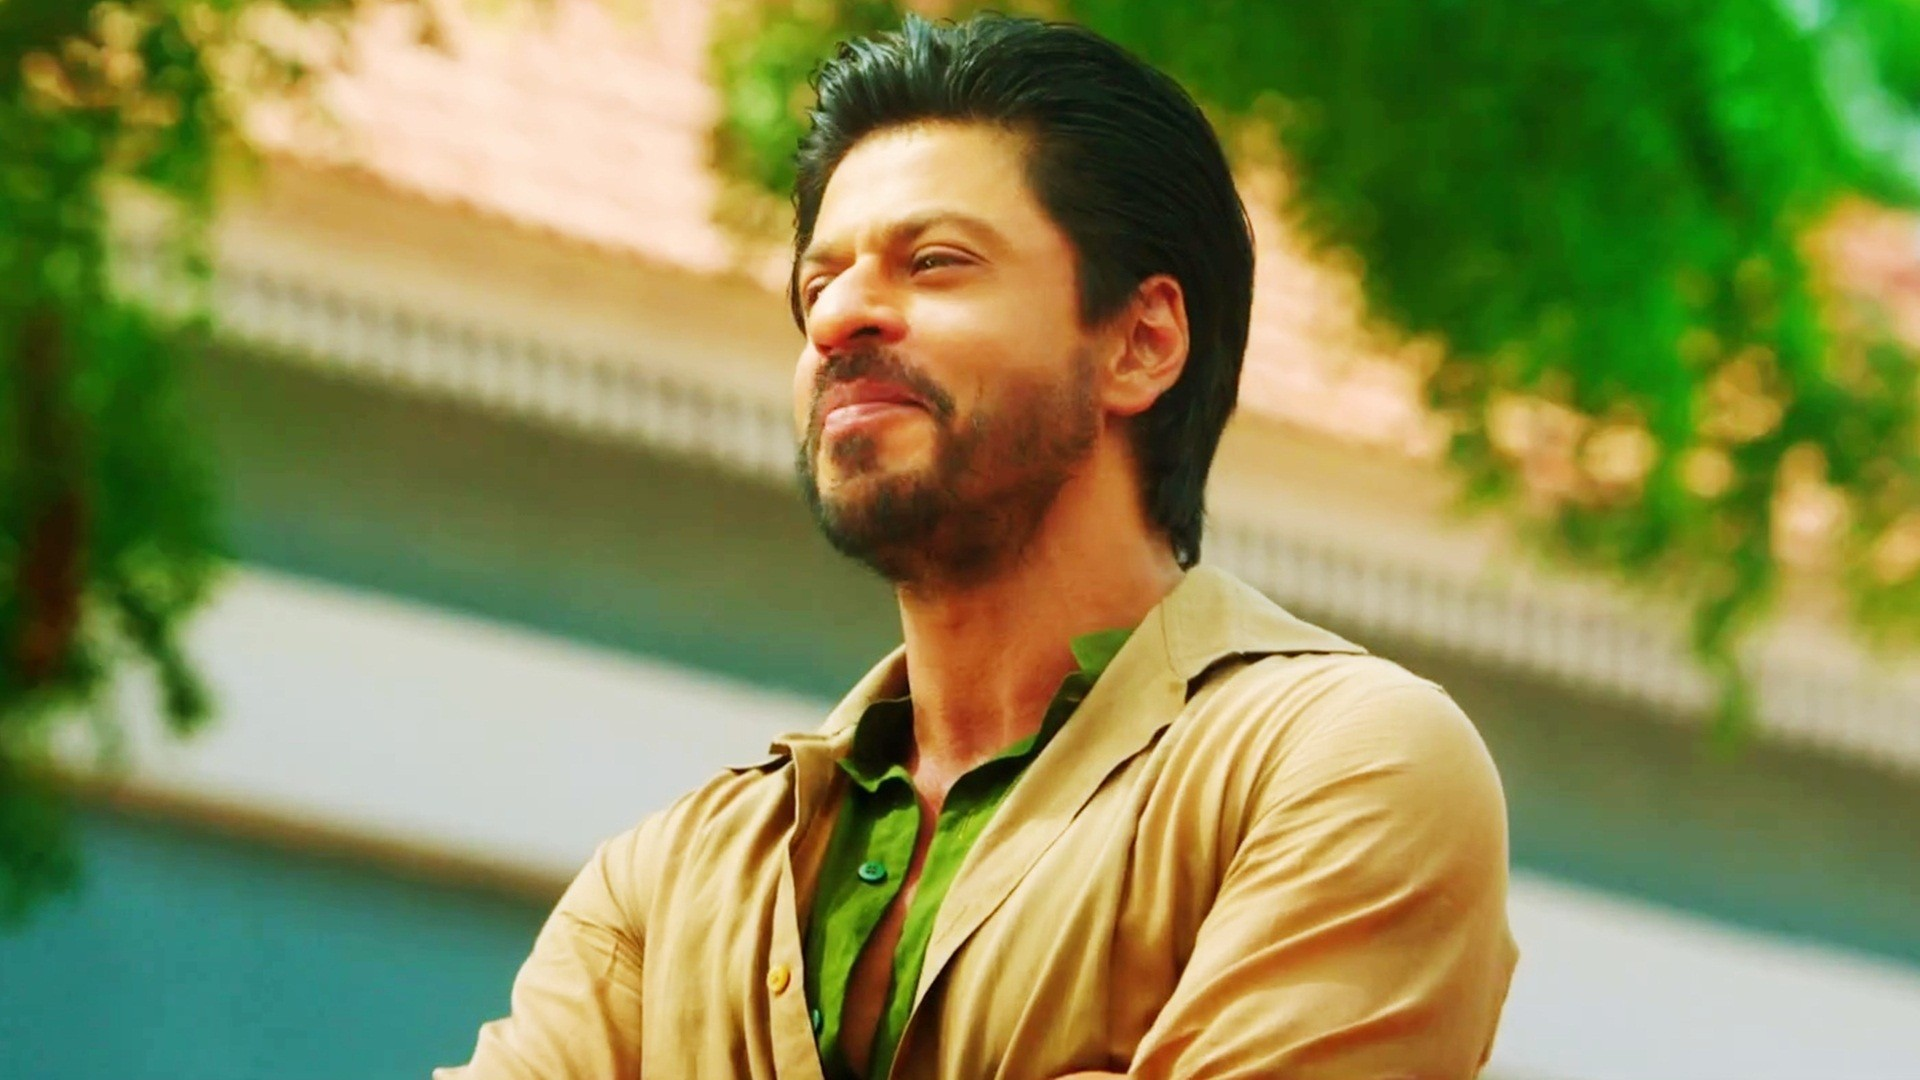 Shah Rukh Khan Hd Background